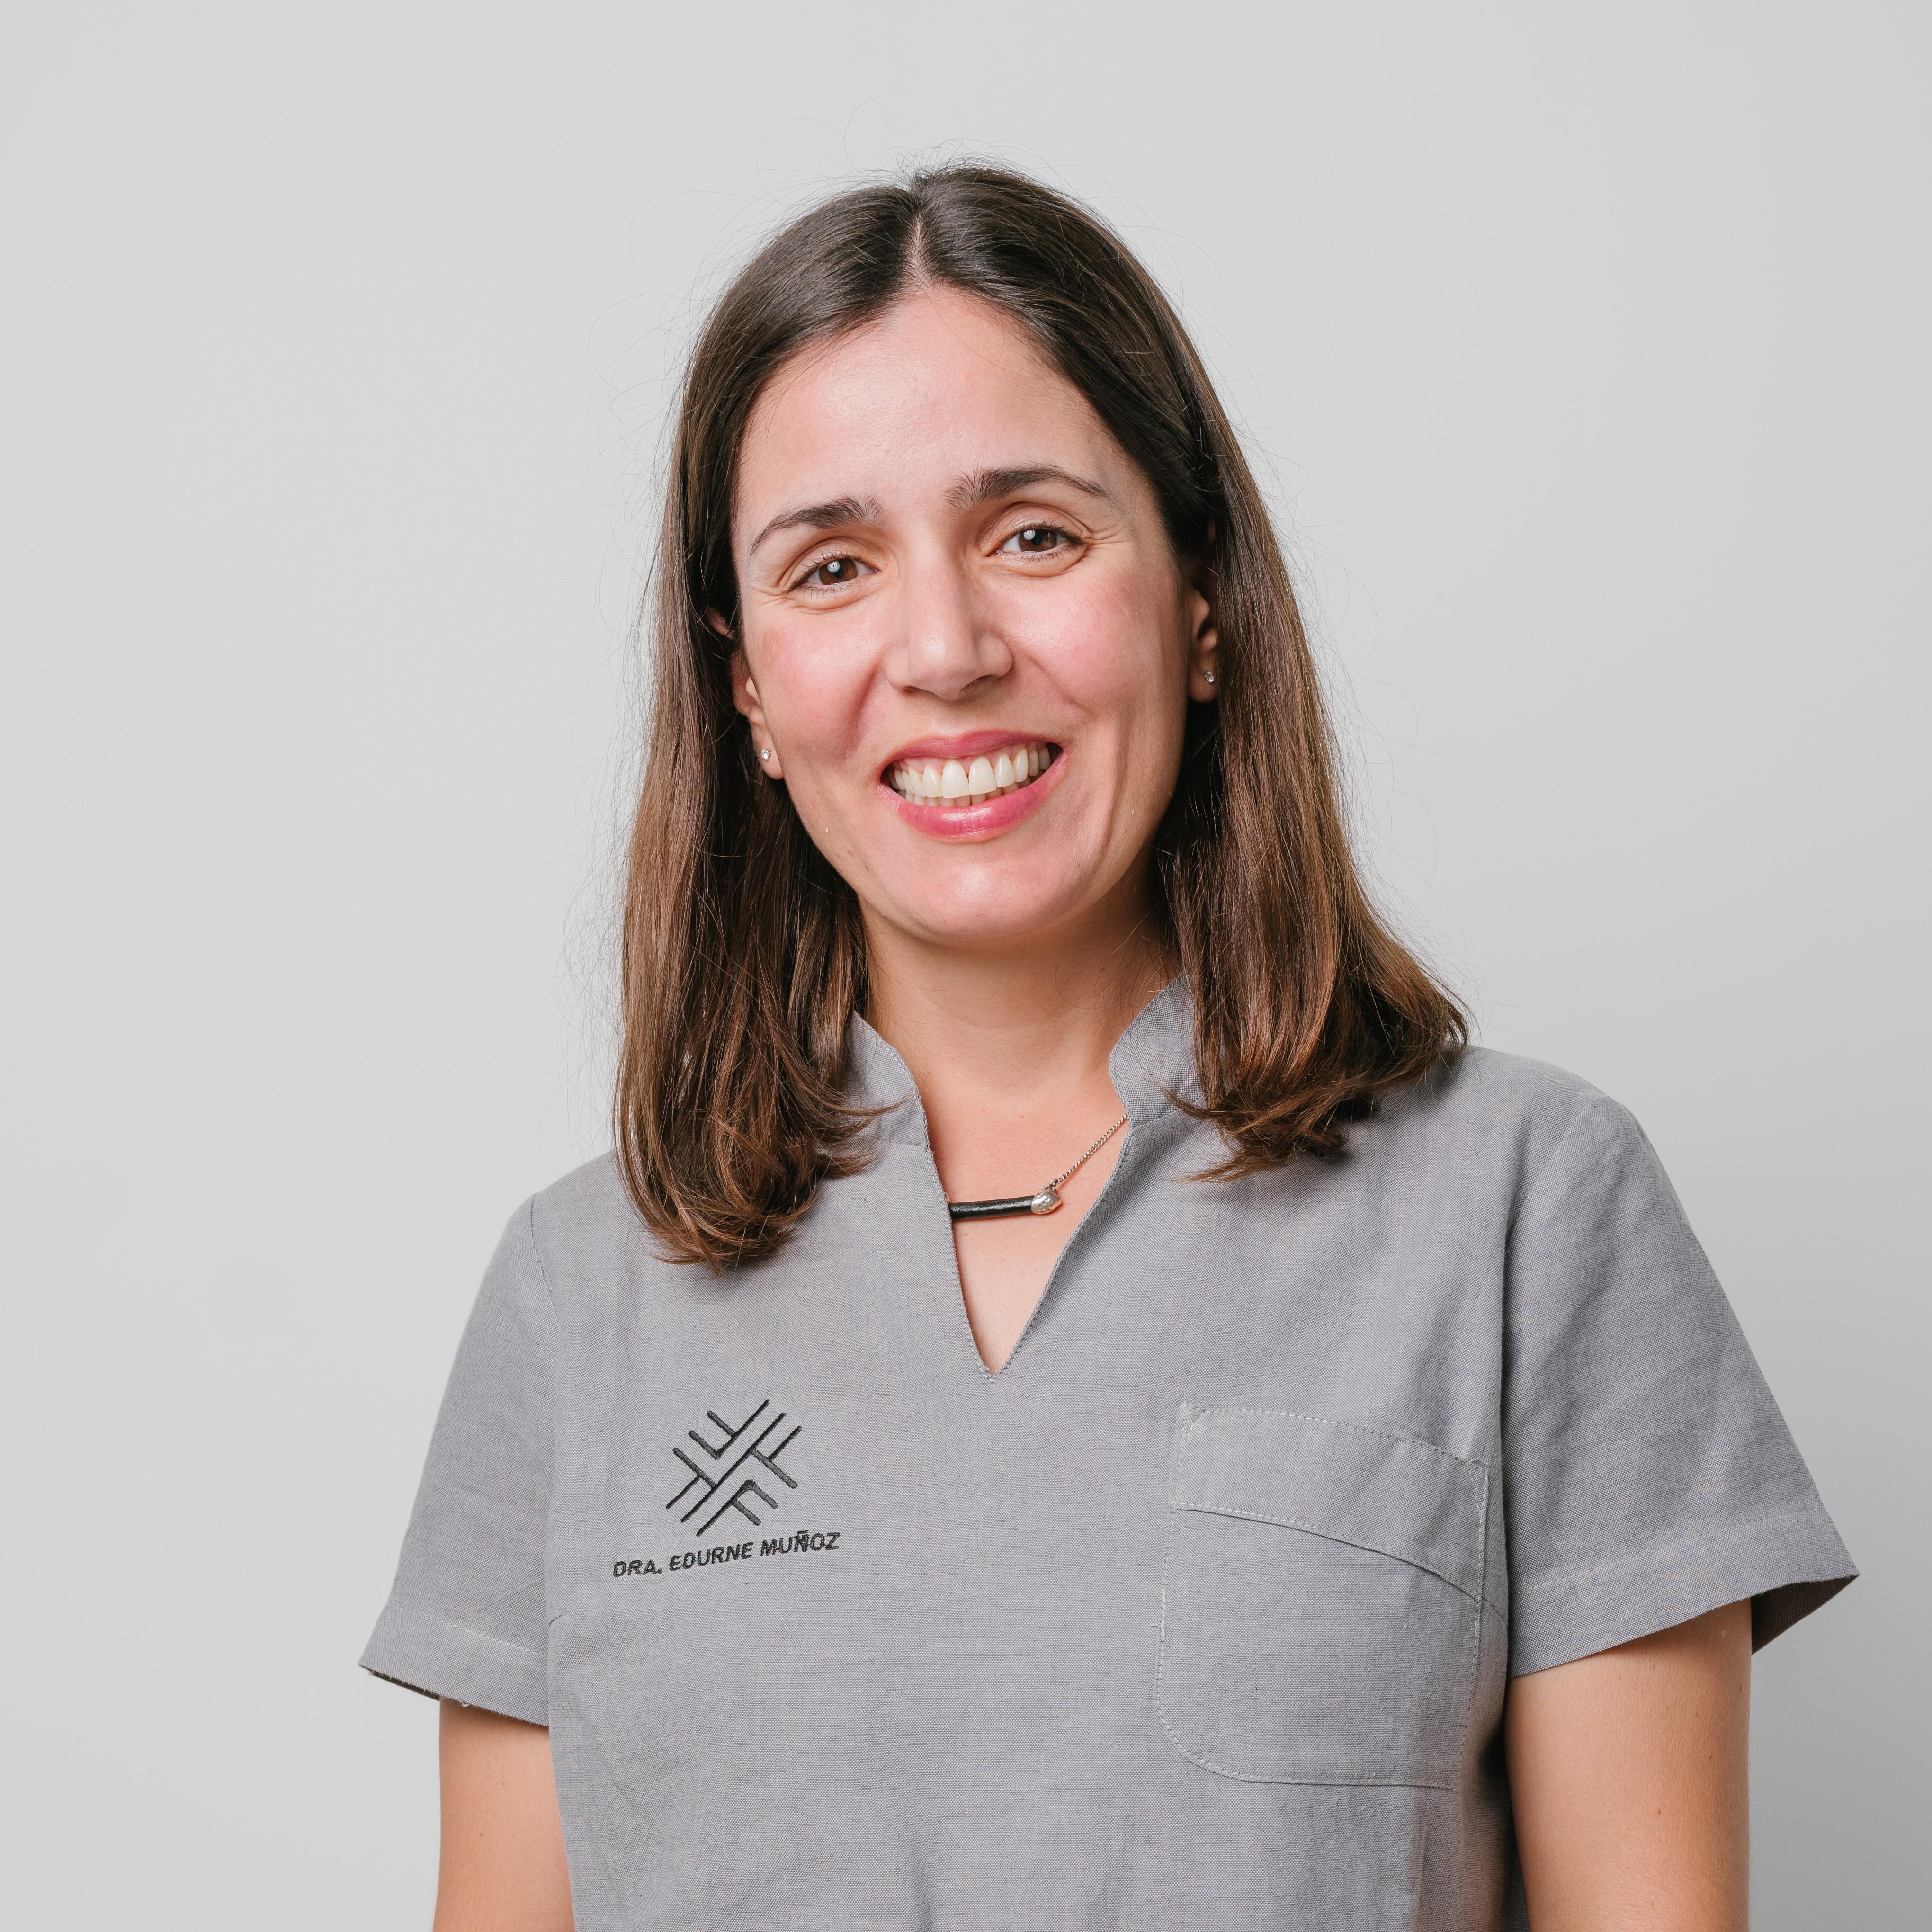 clinica-dental-ayo-munoz-edurne-munoz